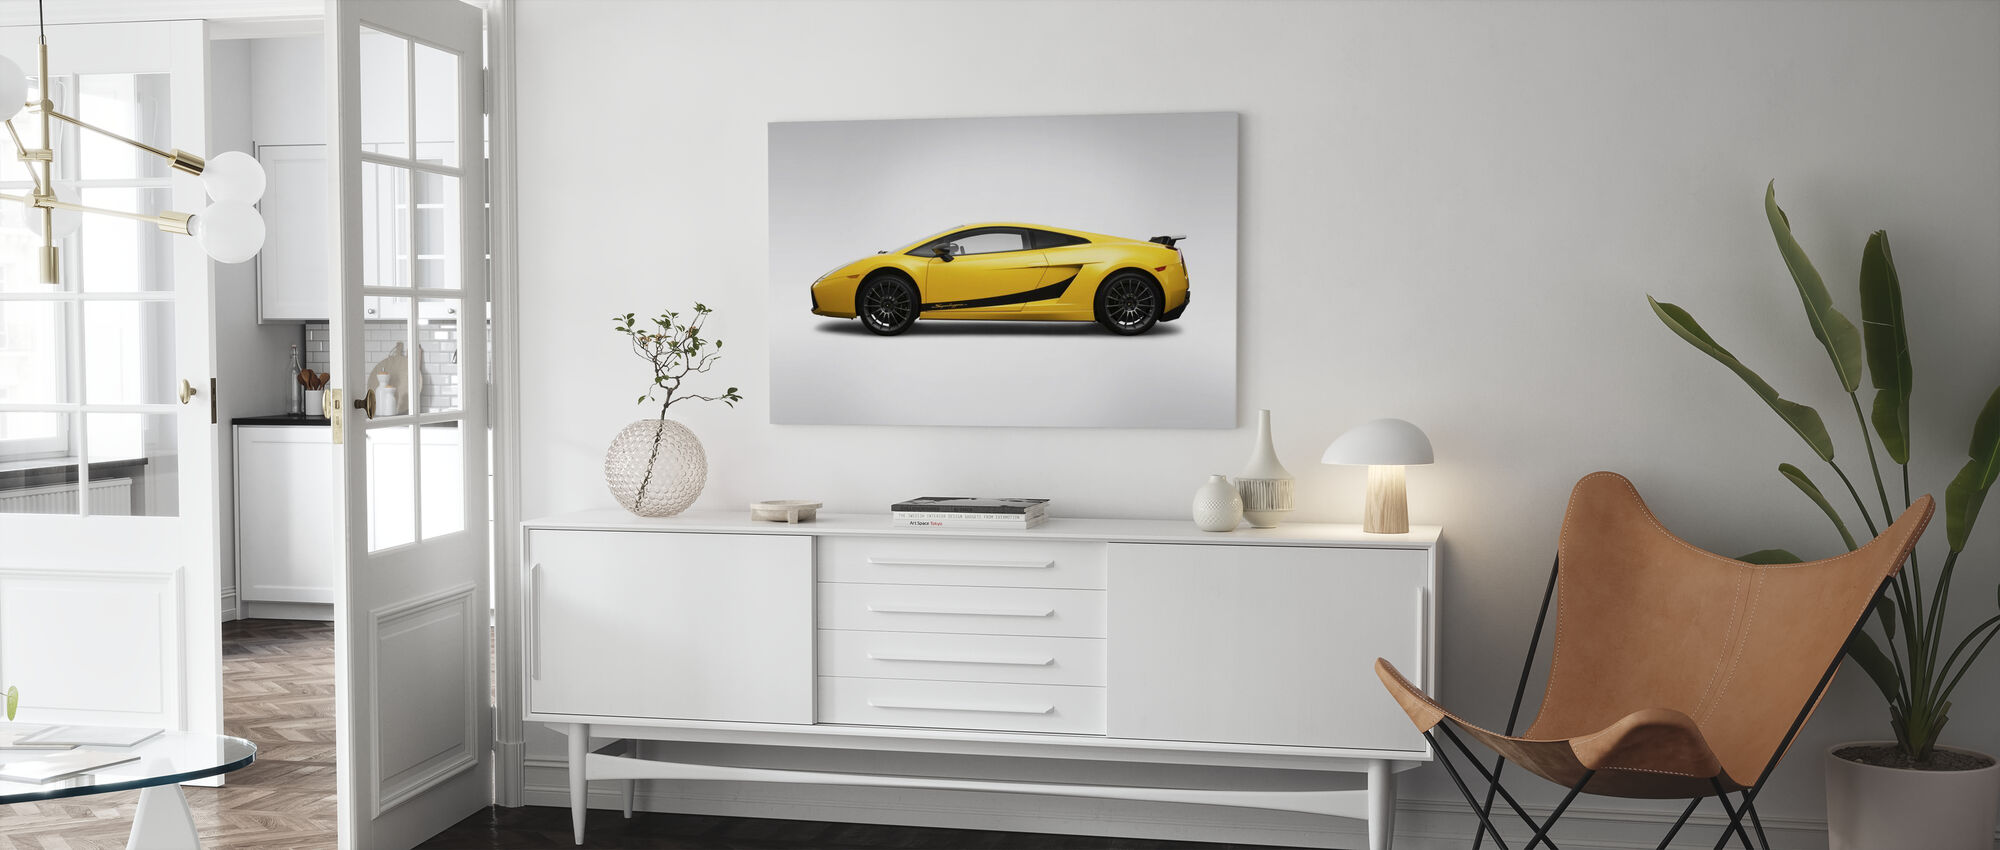 Superleggera - Canvas print - Living Room